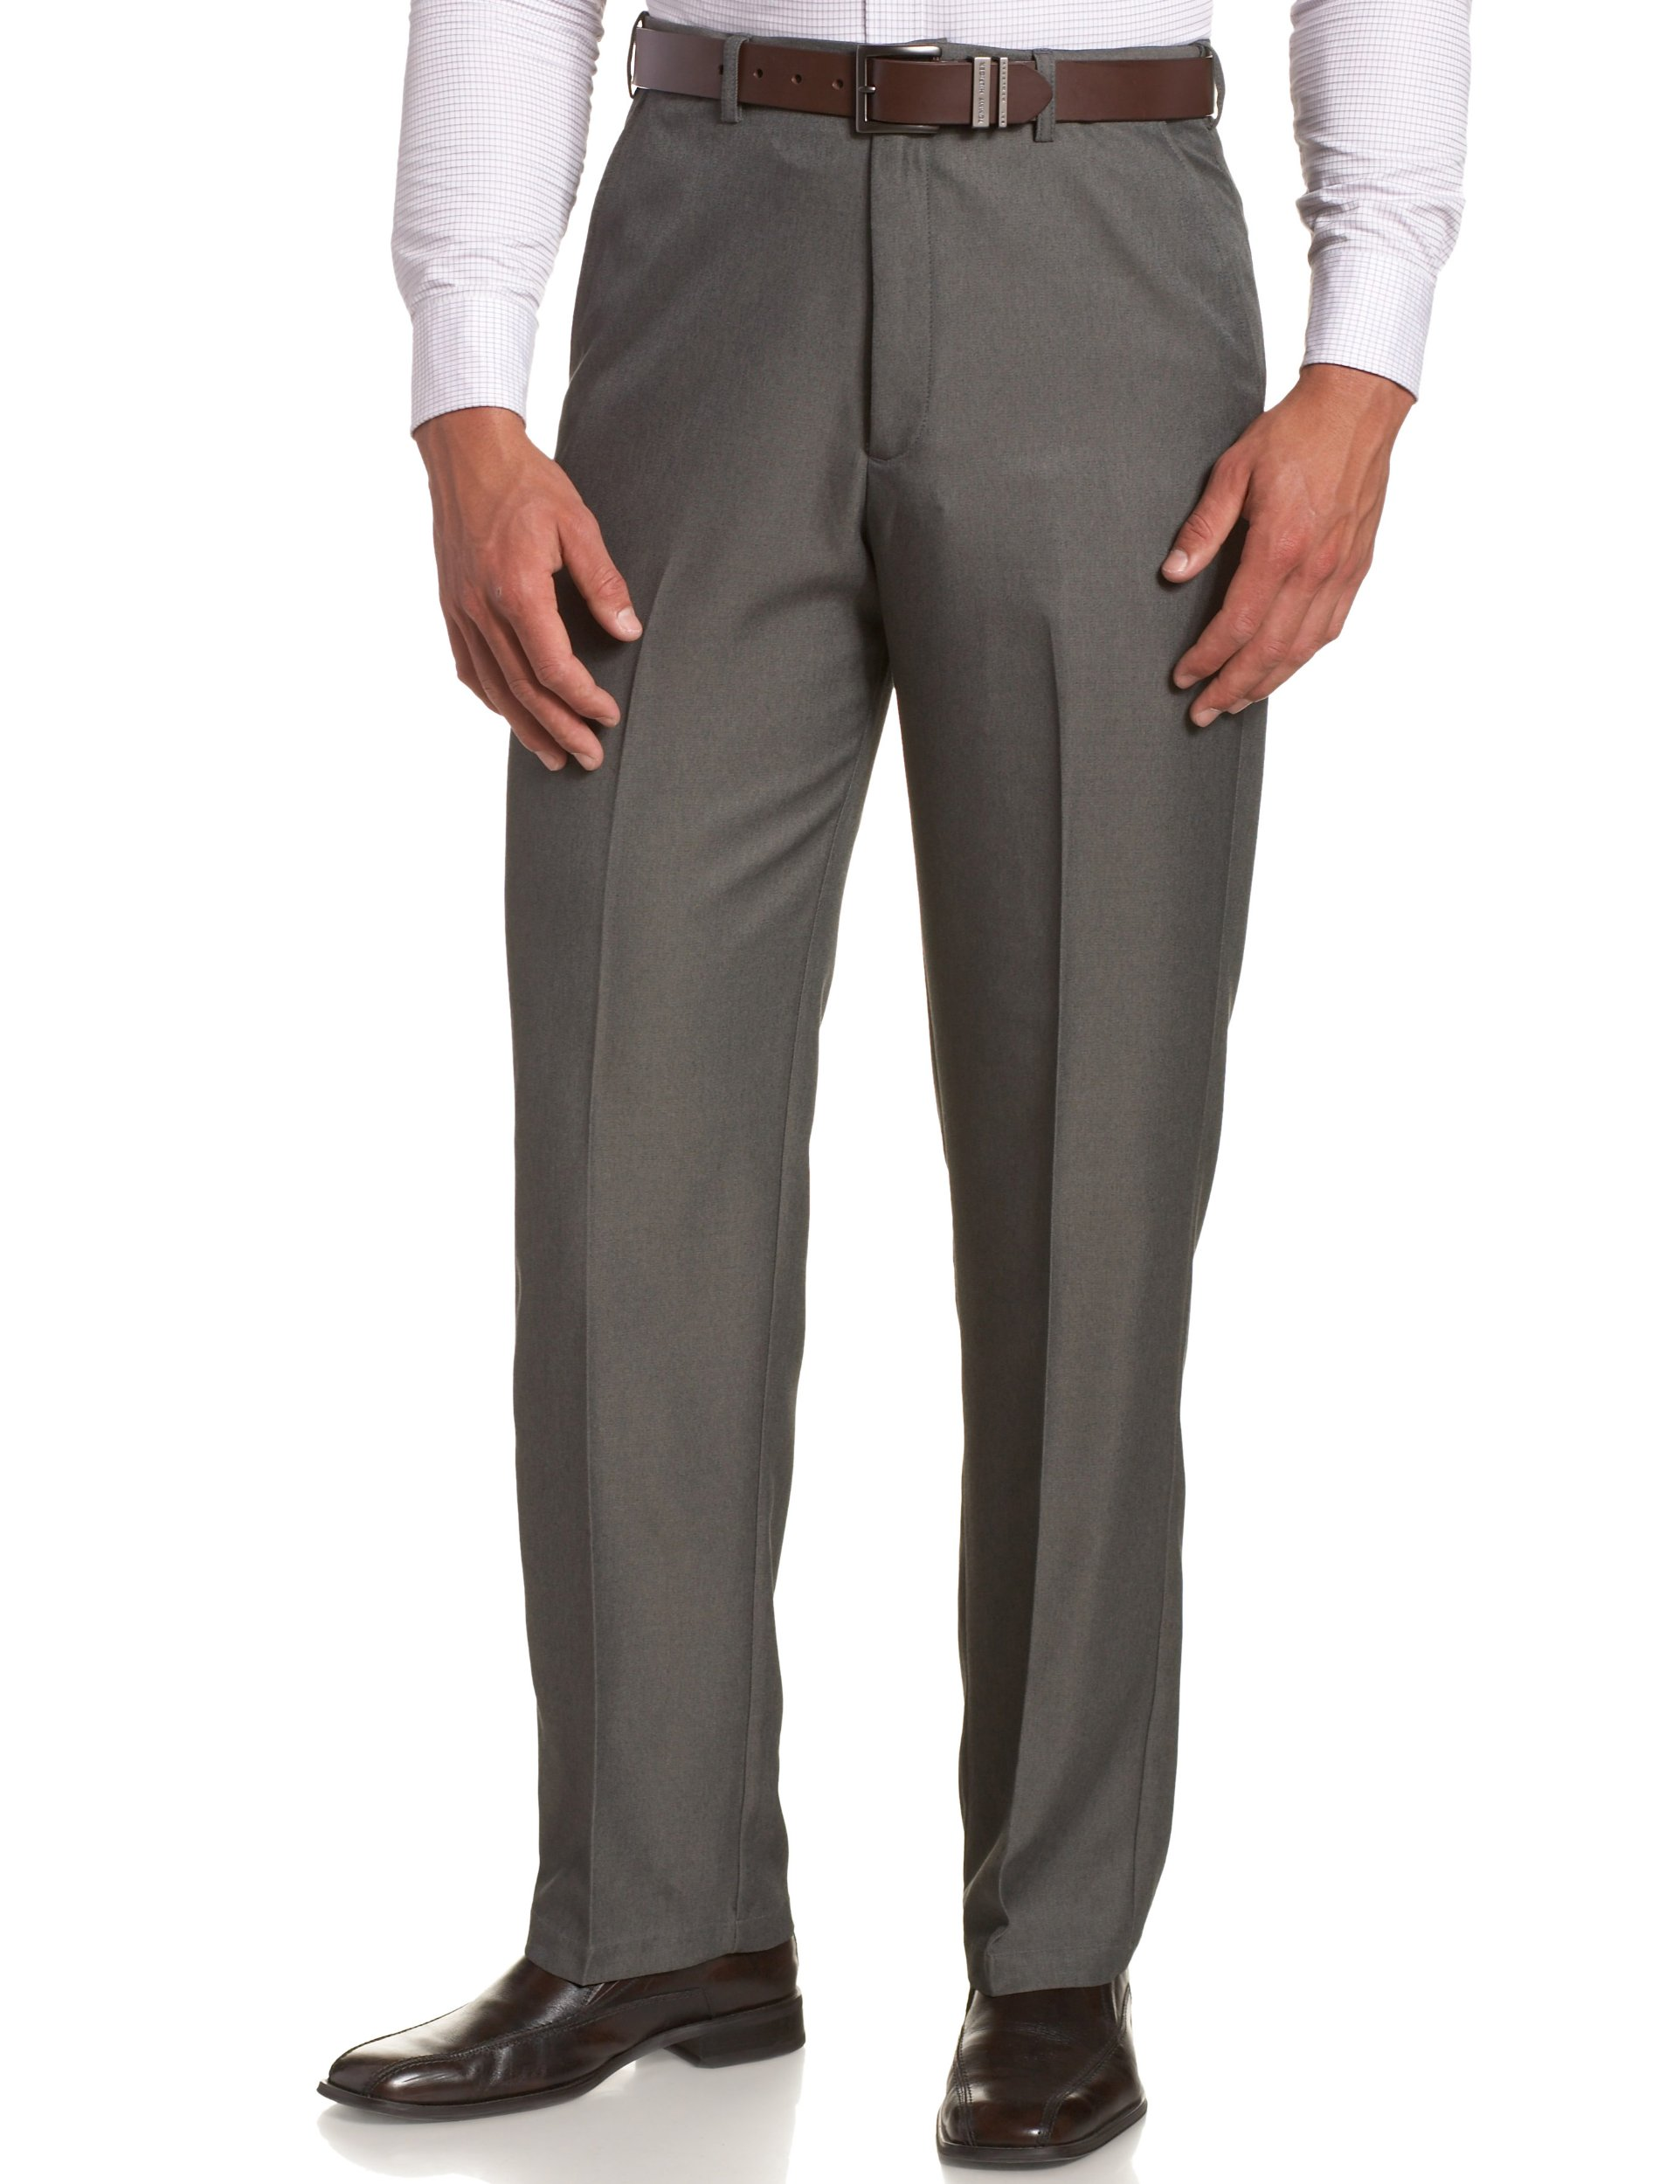 Haggar Men's Big-Tall Cool Gabardine Heather Plain Front Pant, Graphite, 46x30 by Haggar